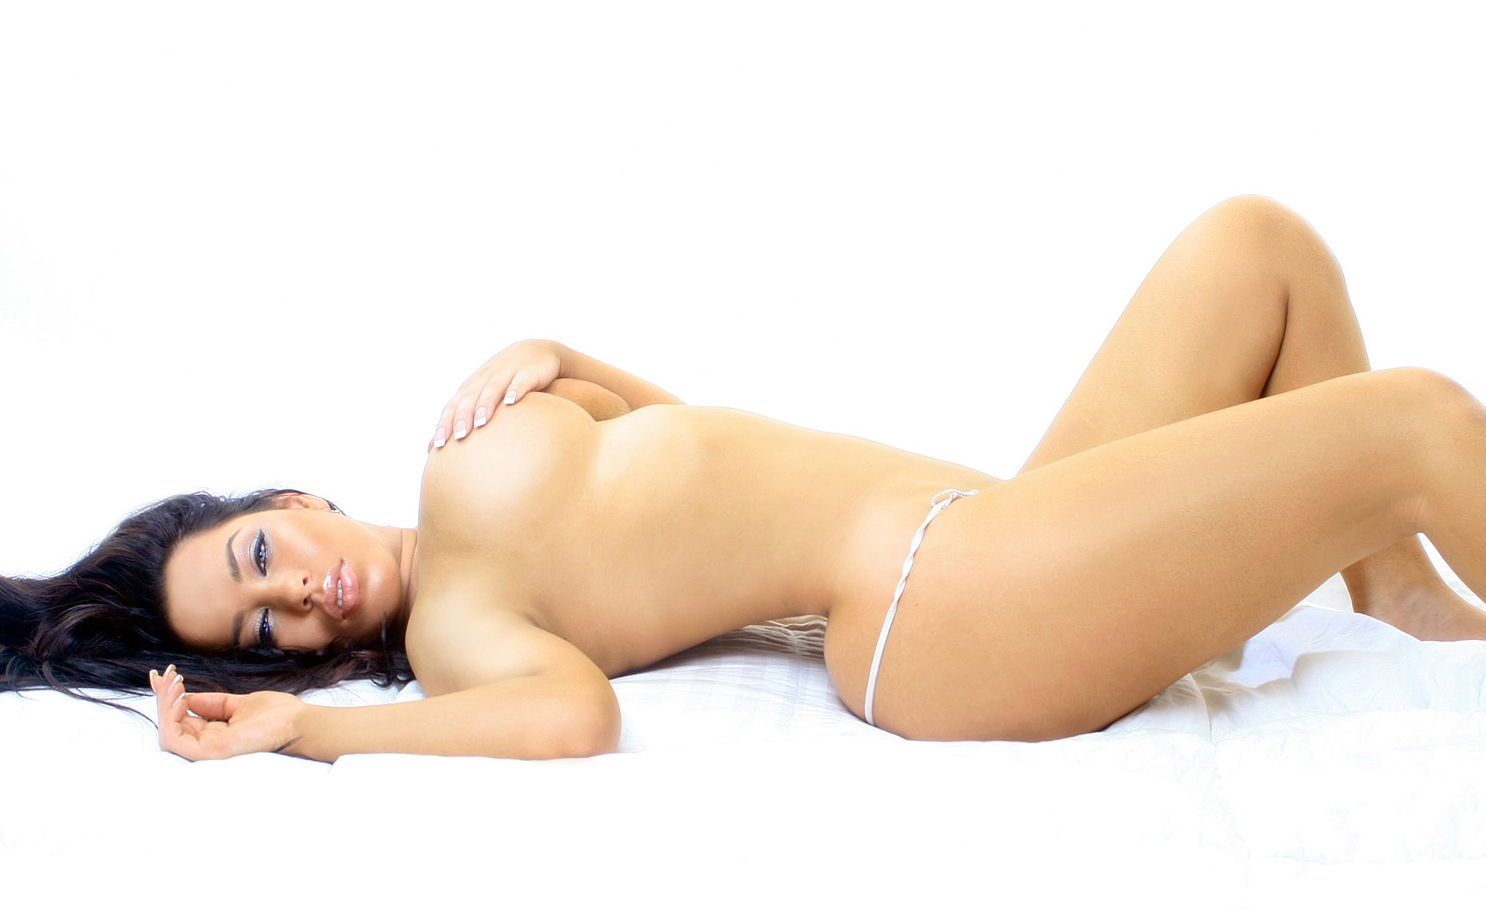 girl generation naked porn